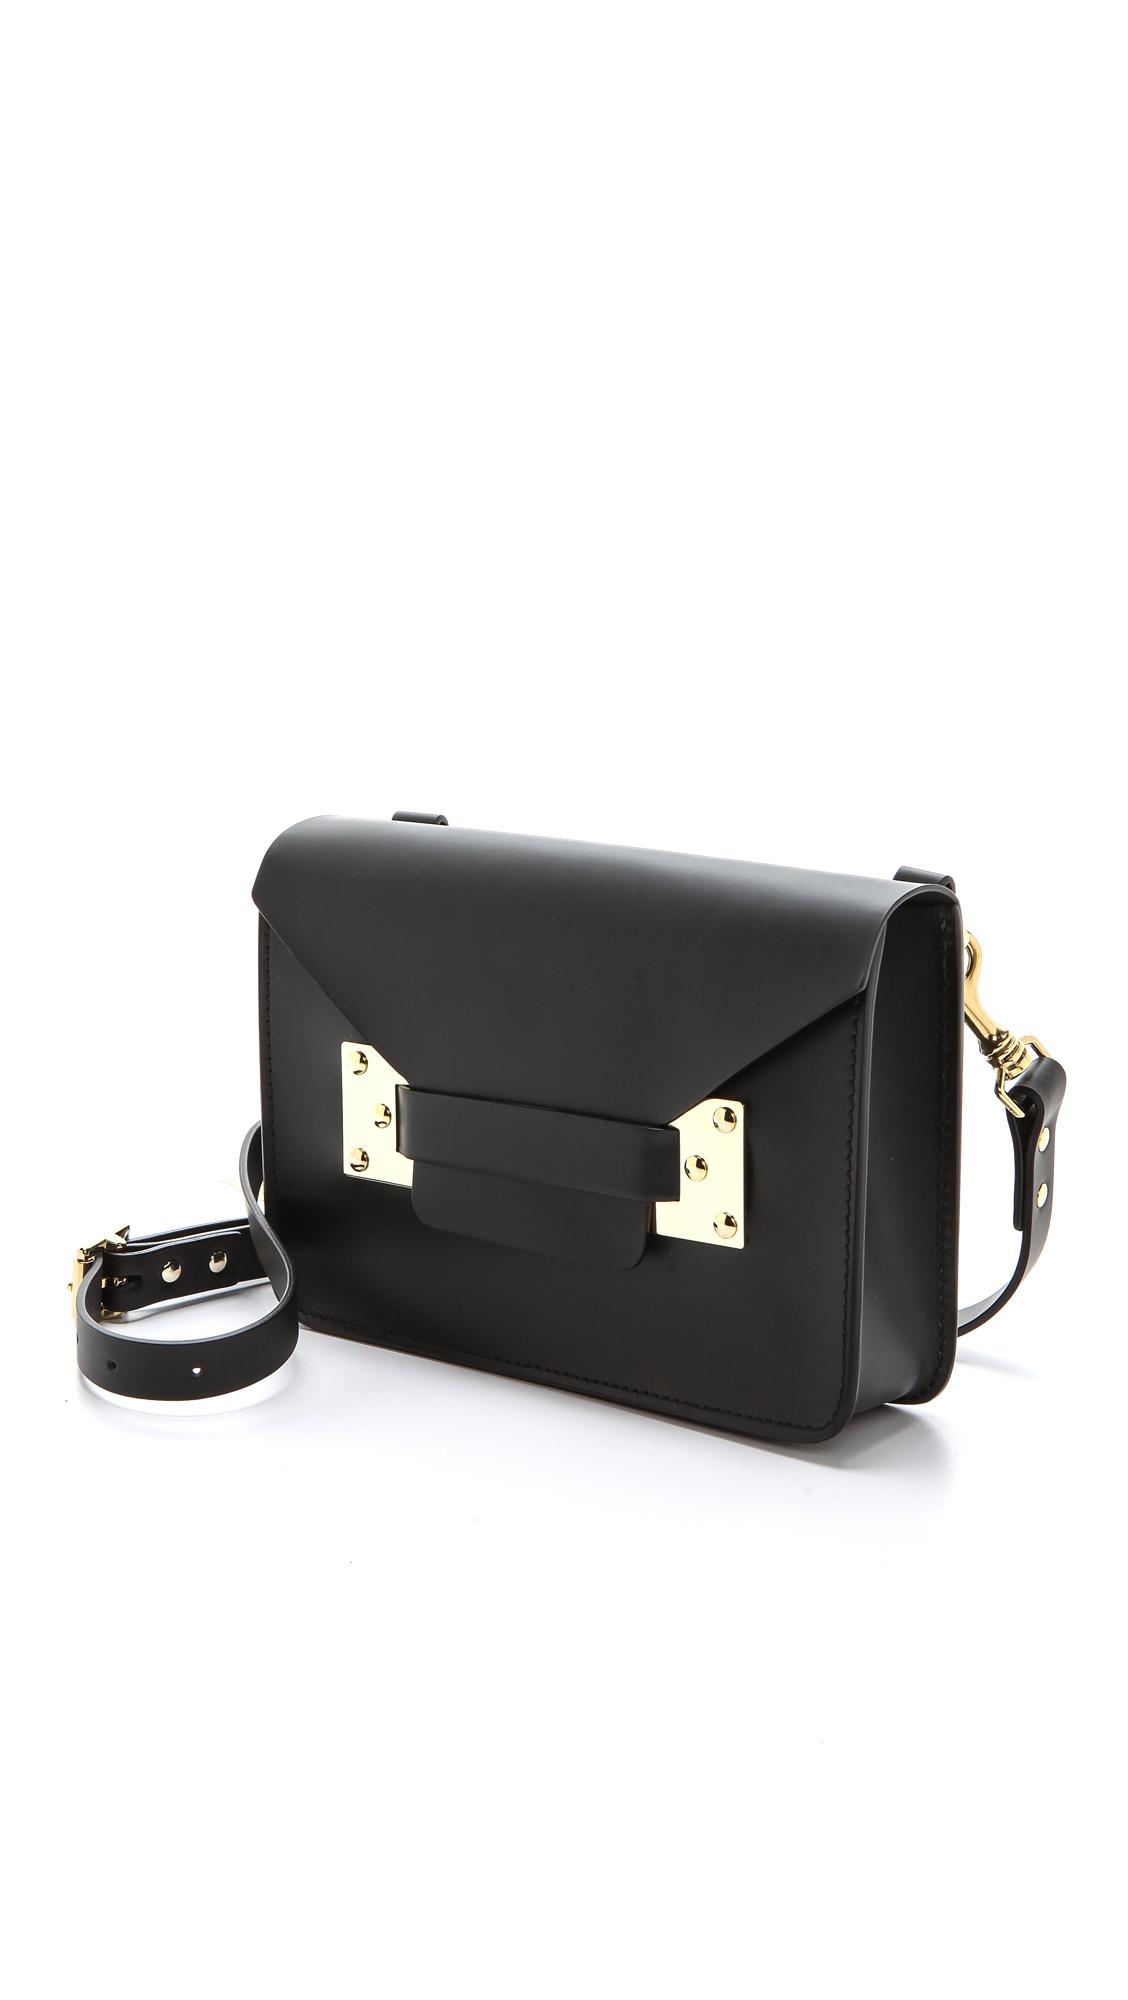 Sophie Hulme Mini Envelope Bag In Black Lyst